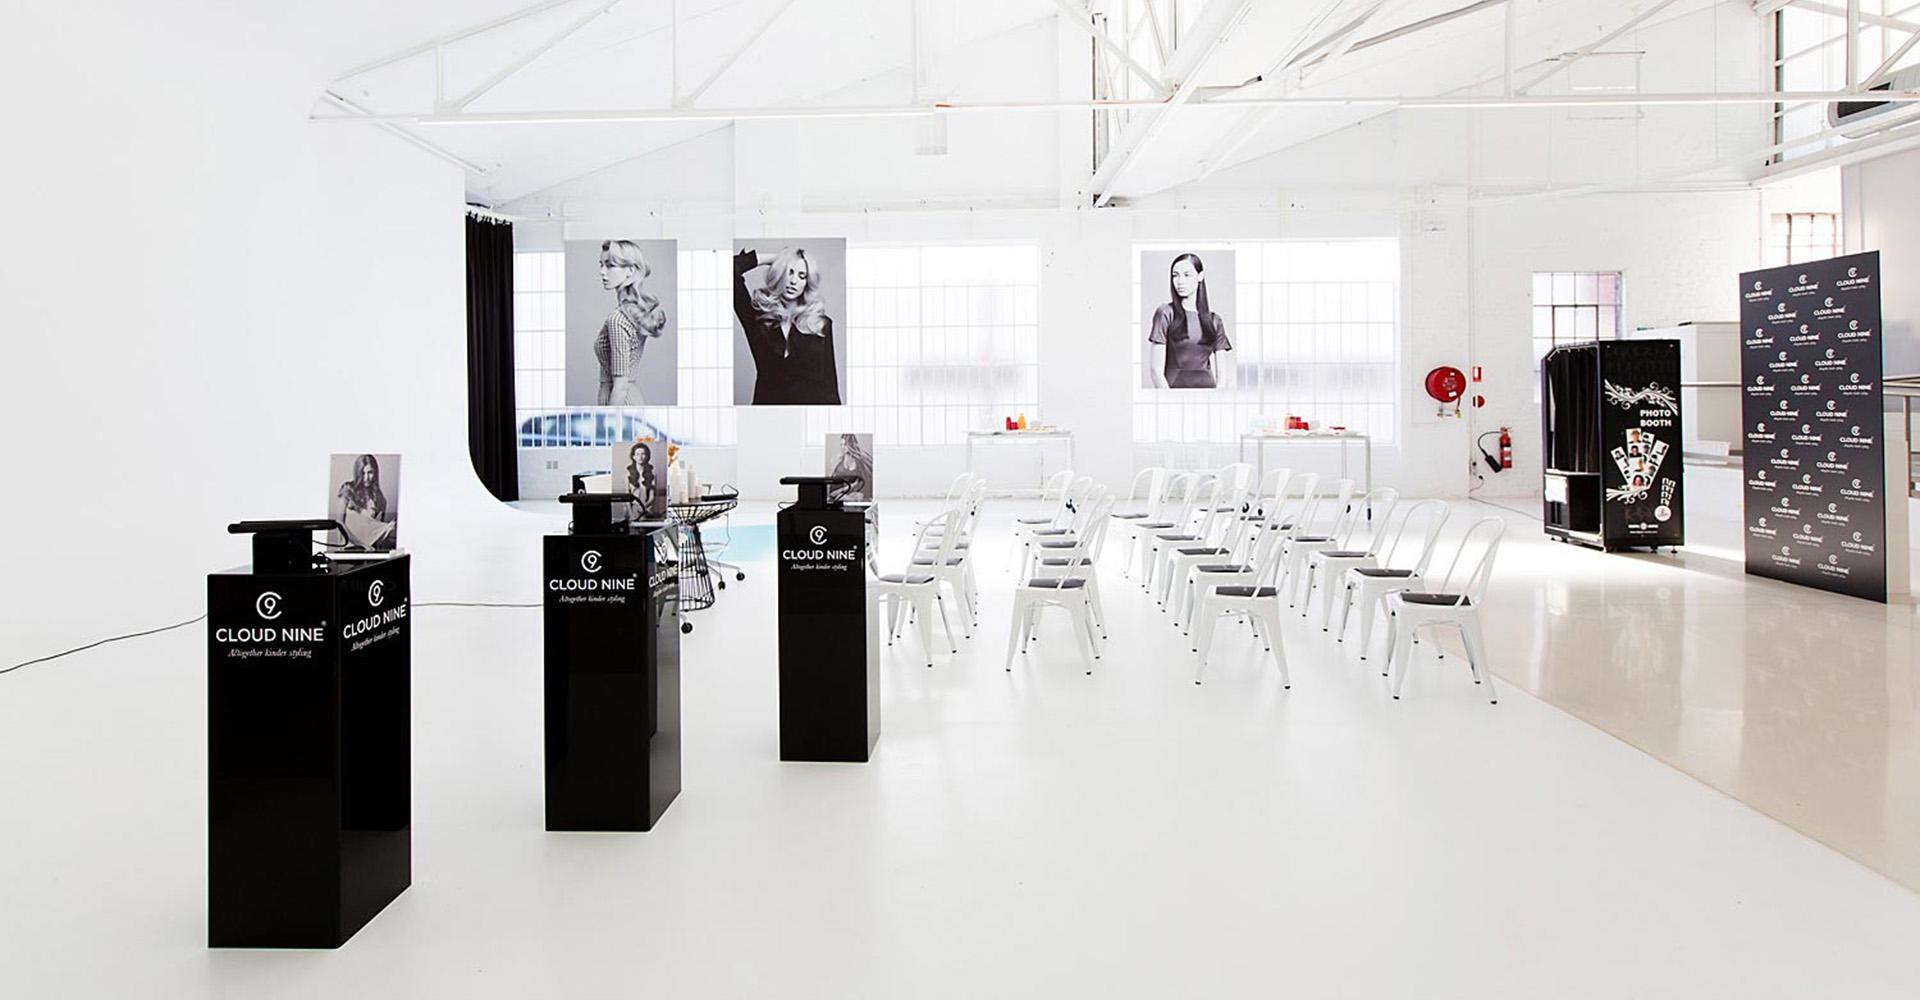 pix_on_location_studio_fashion_events_03_50